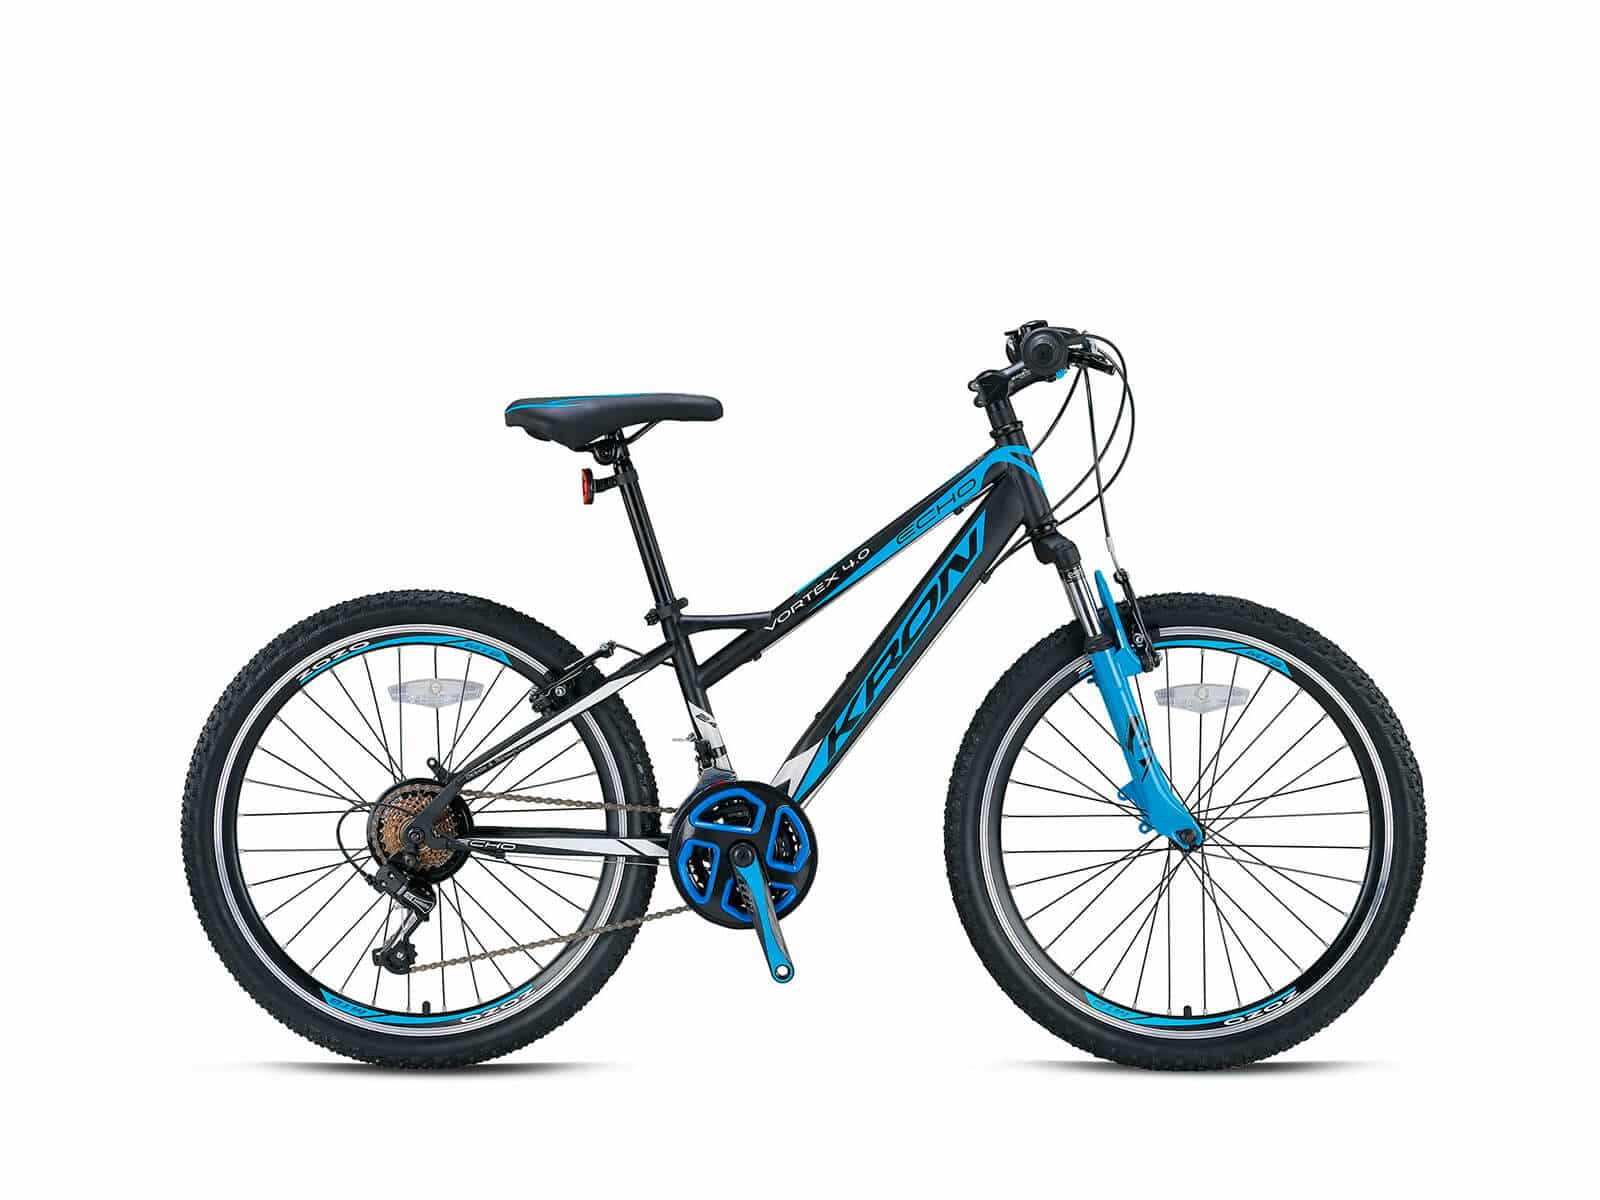 Kron Παιδικό Ποδήλατο Vortex 4.0 - Παιδικά Ποδήλατα